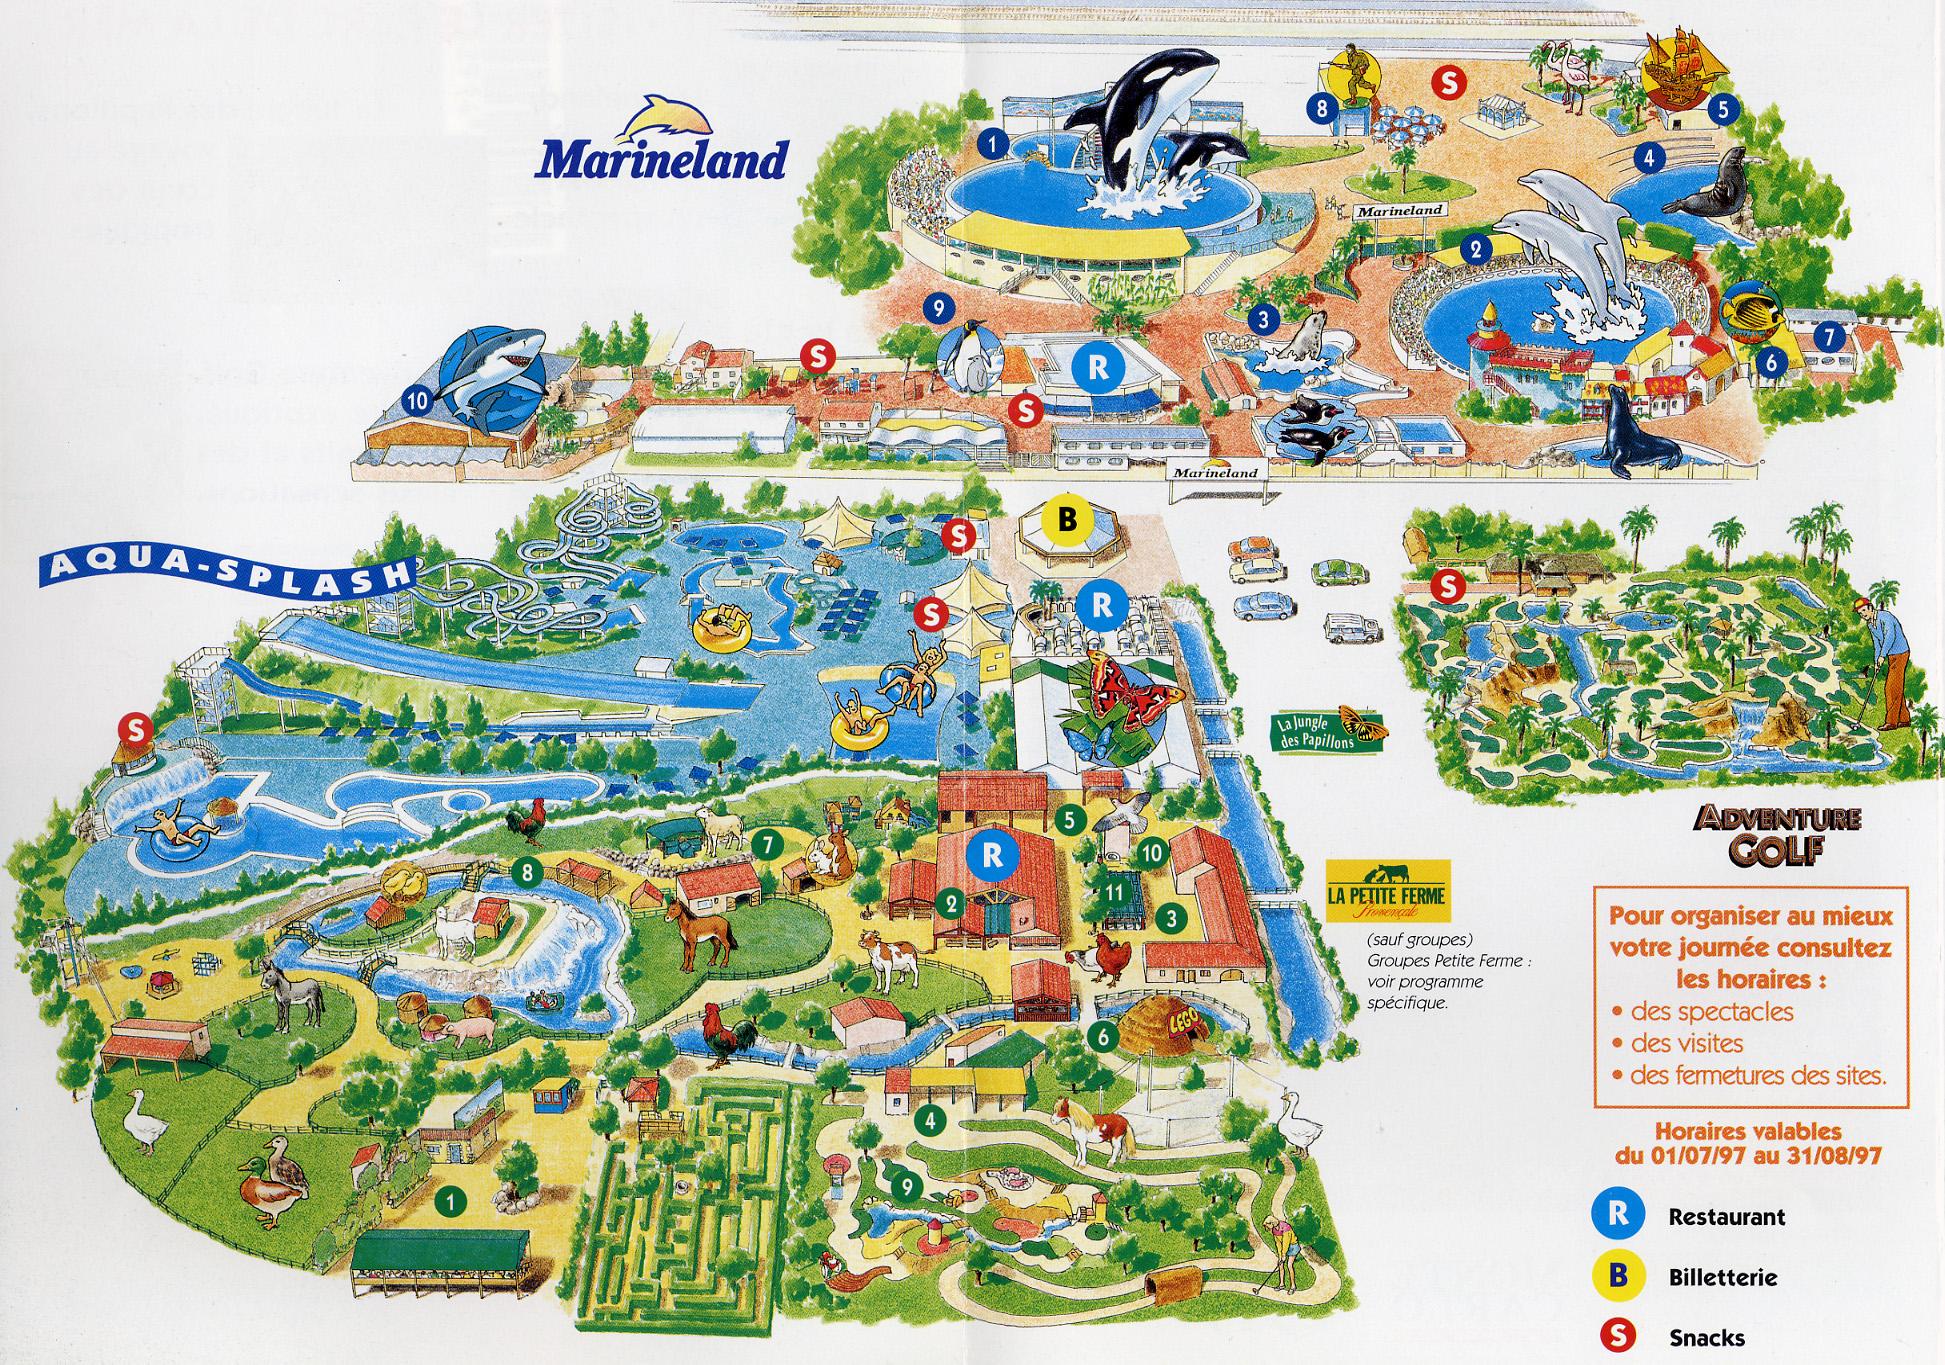 [Images] Ancien plan de Marineland Antibes_plan_1997